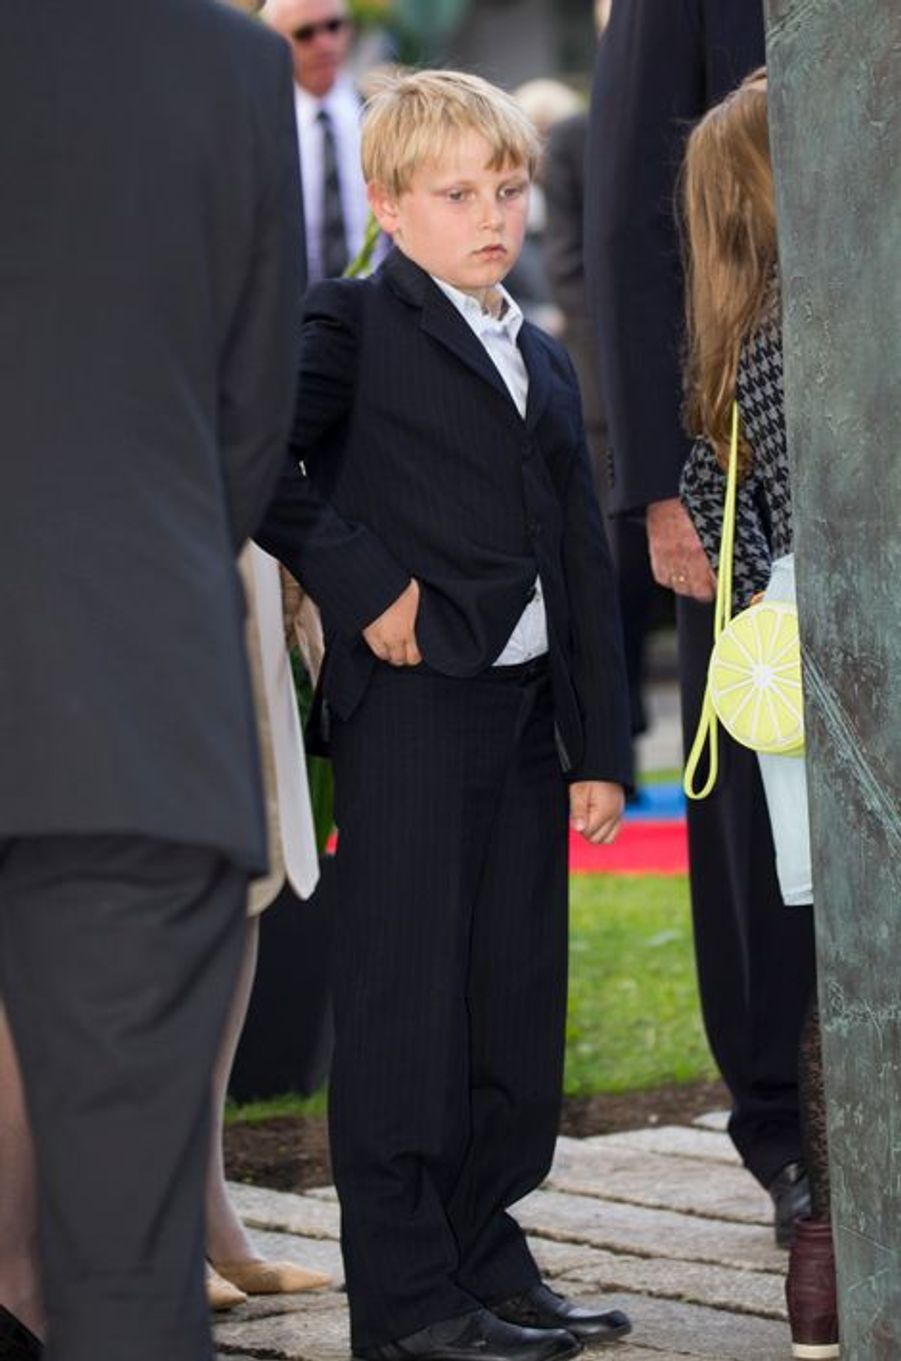 Le prince Sverre-Magnus à Oslo le 7 juin 2015